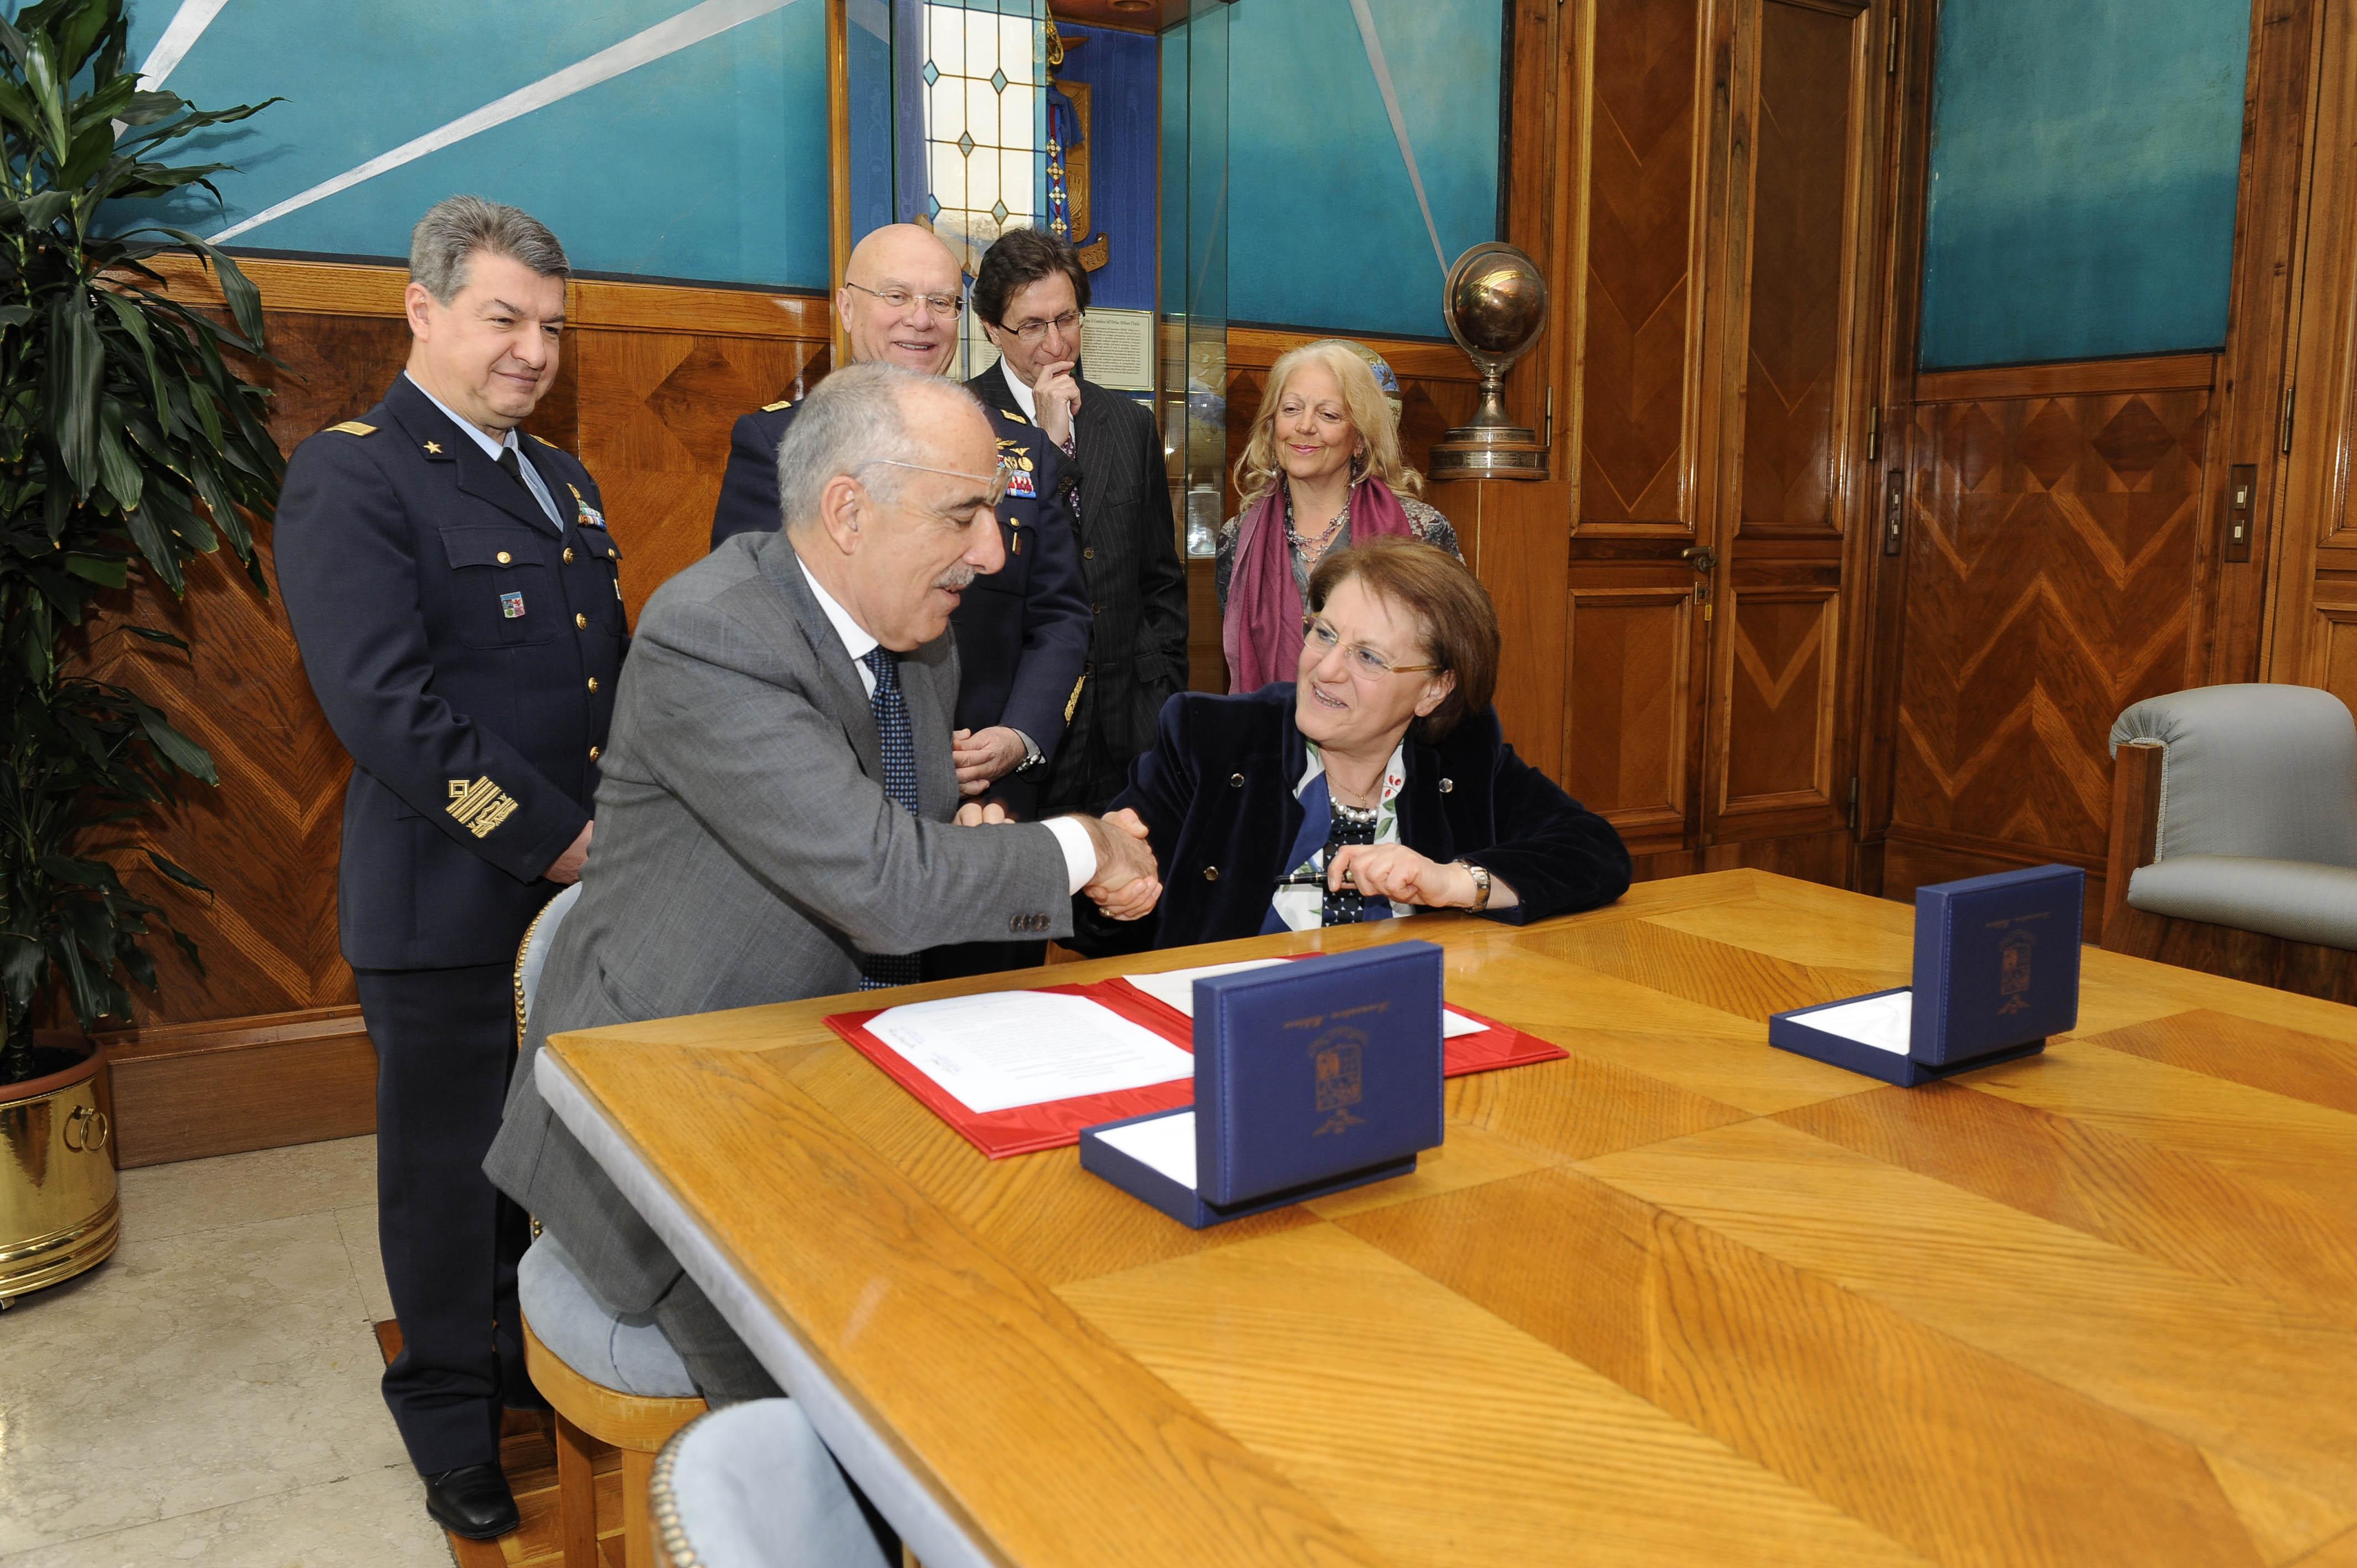 M-346 - assinatura contrato 9 exemplares 18mar2016- foto 2 Forca Aerea Italiana